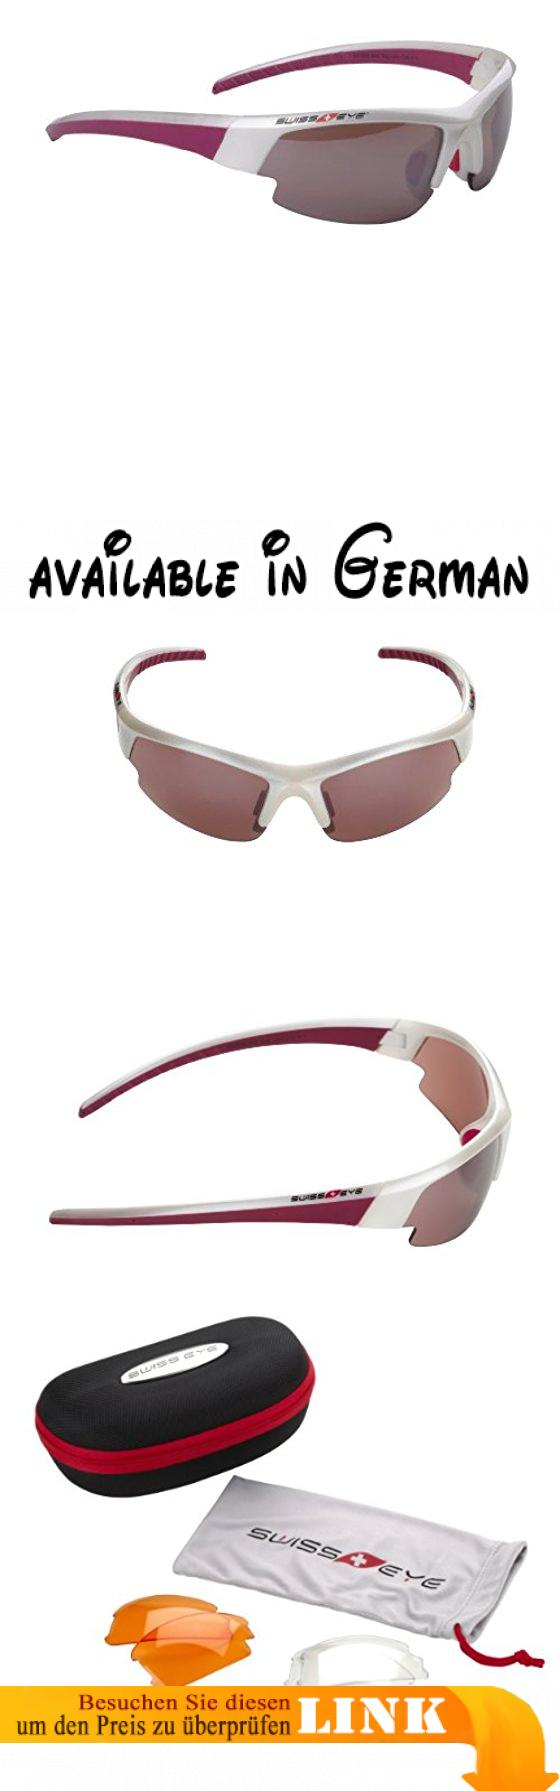 Swiss Eye Sportbrille Gardosa Evolution S, Pearl White/Purple, One Size, 12136